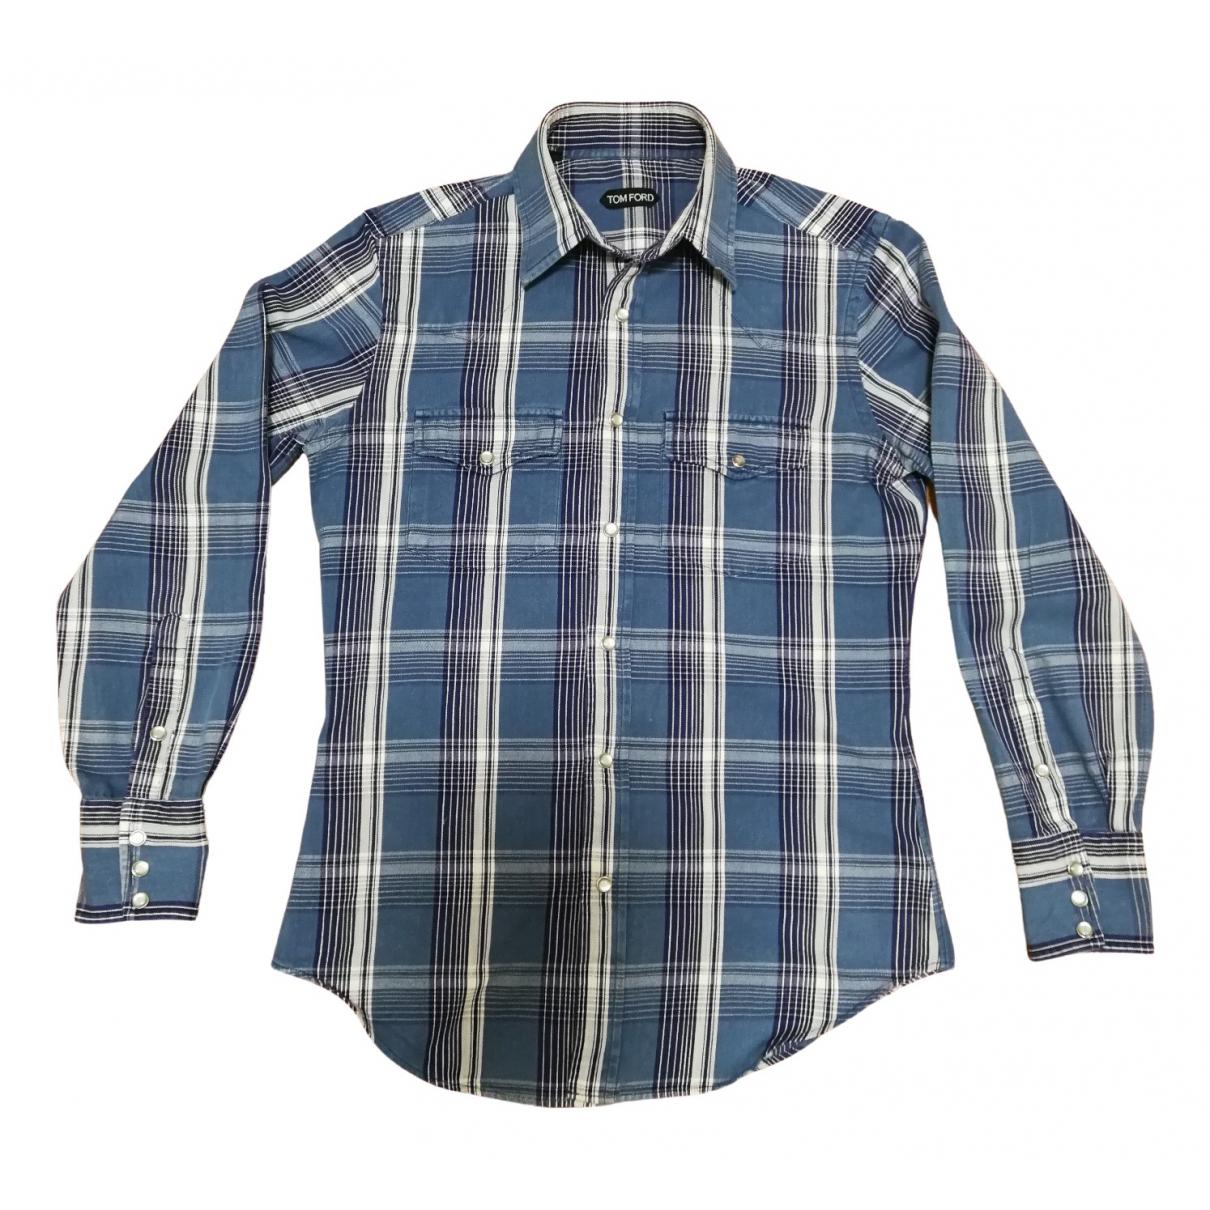 Tom Ford \N Hemden in  Blau Denim - Jeans